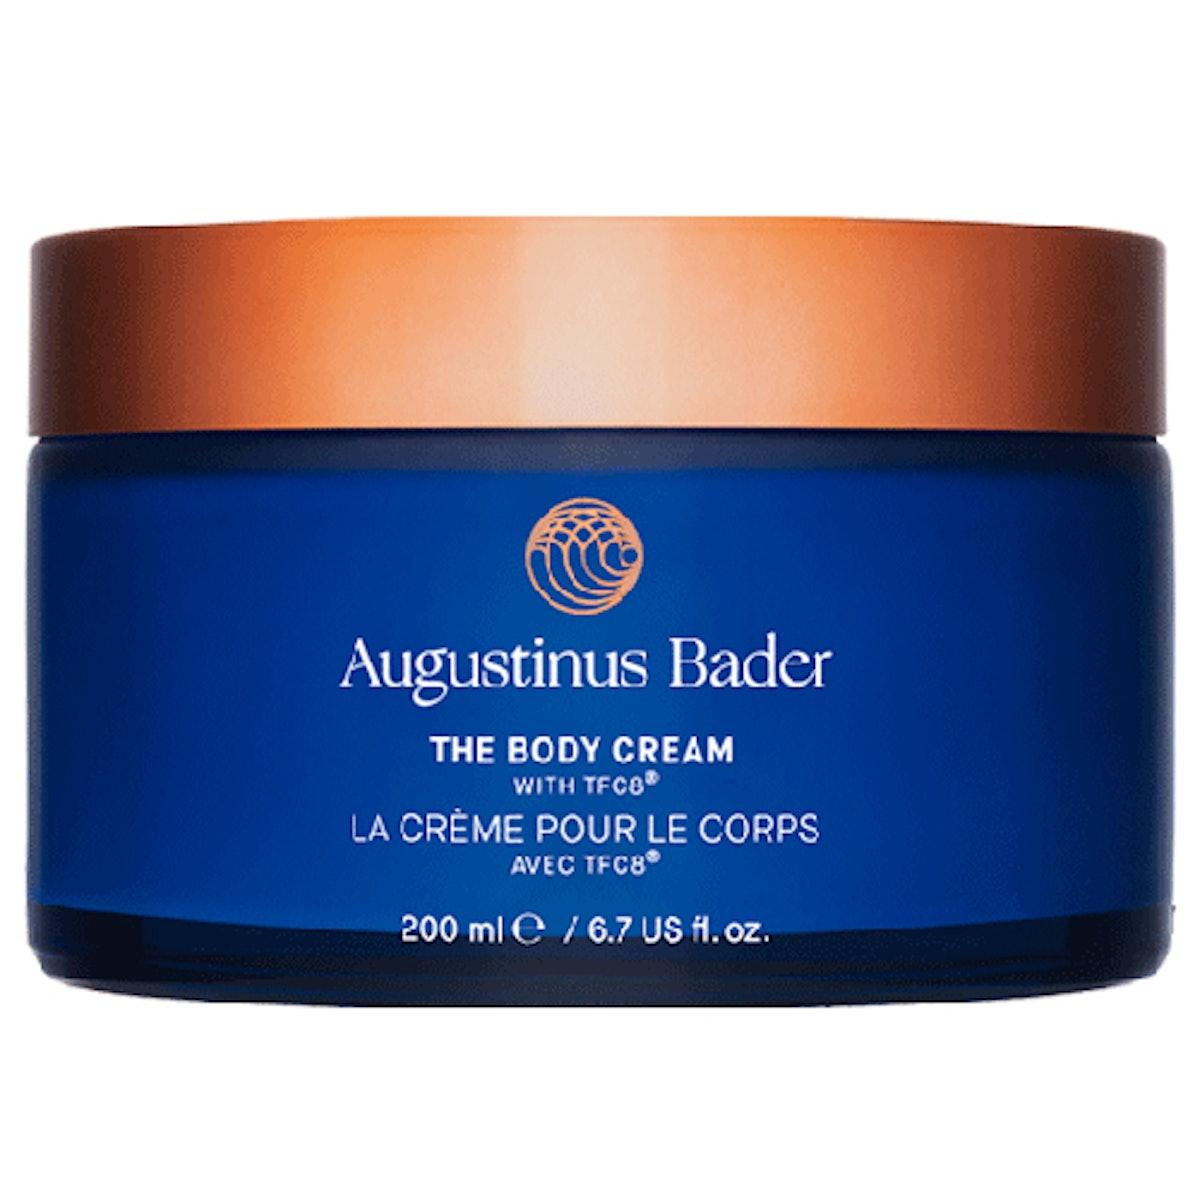 The Body Cream